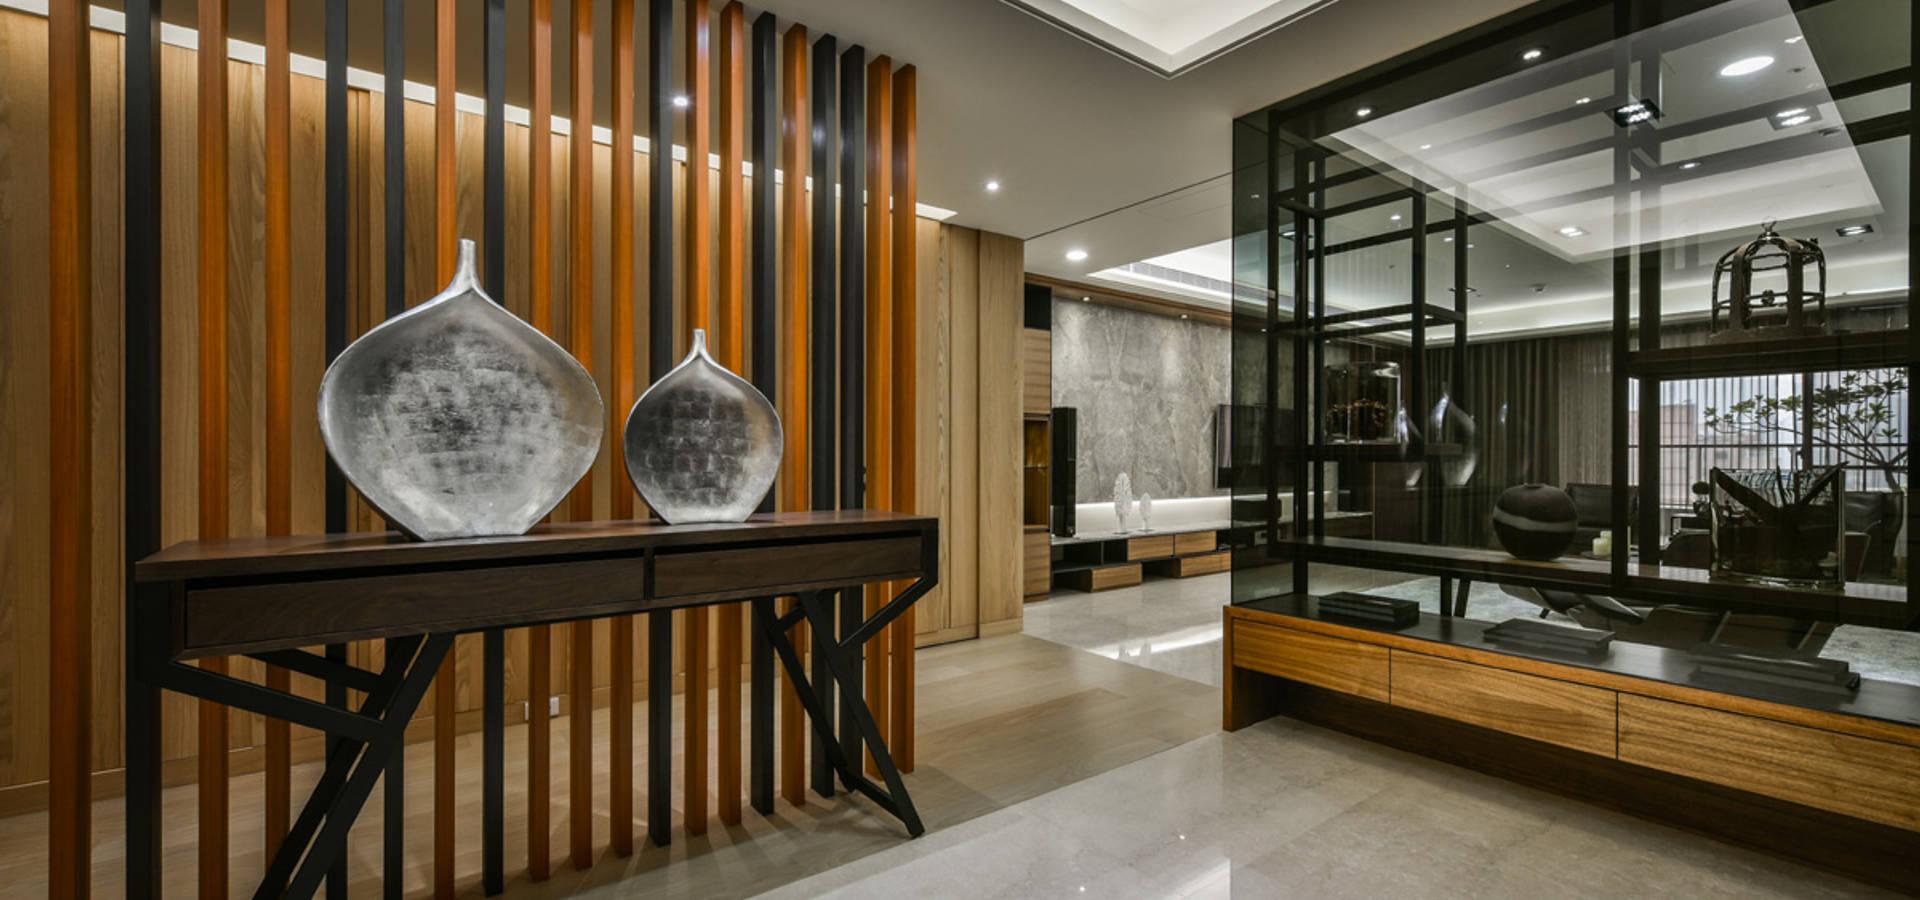 匯羽設計 / Hui-yu Interior design